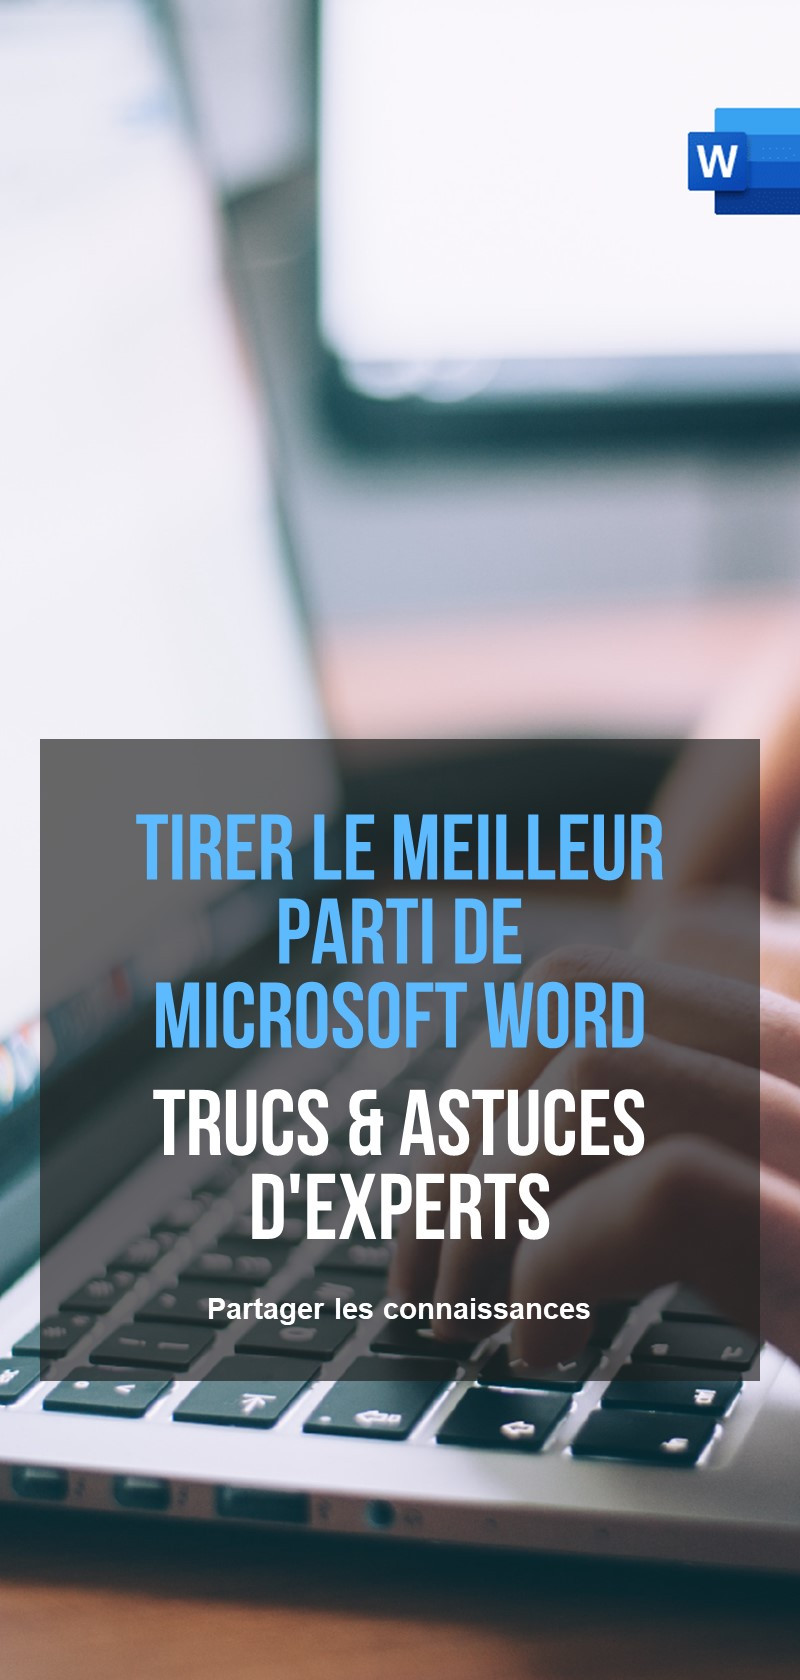 Spécialistes Microsoft Word